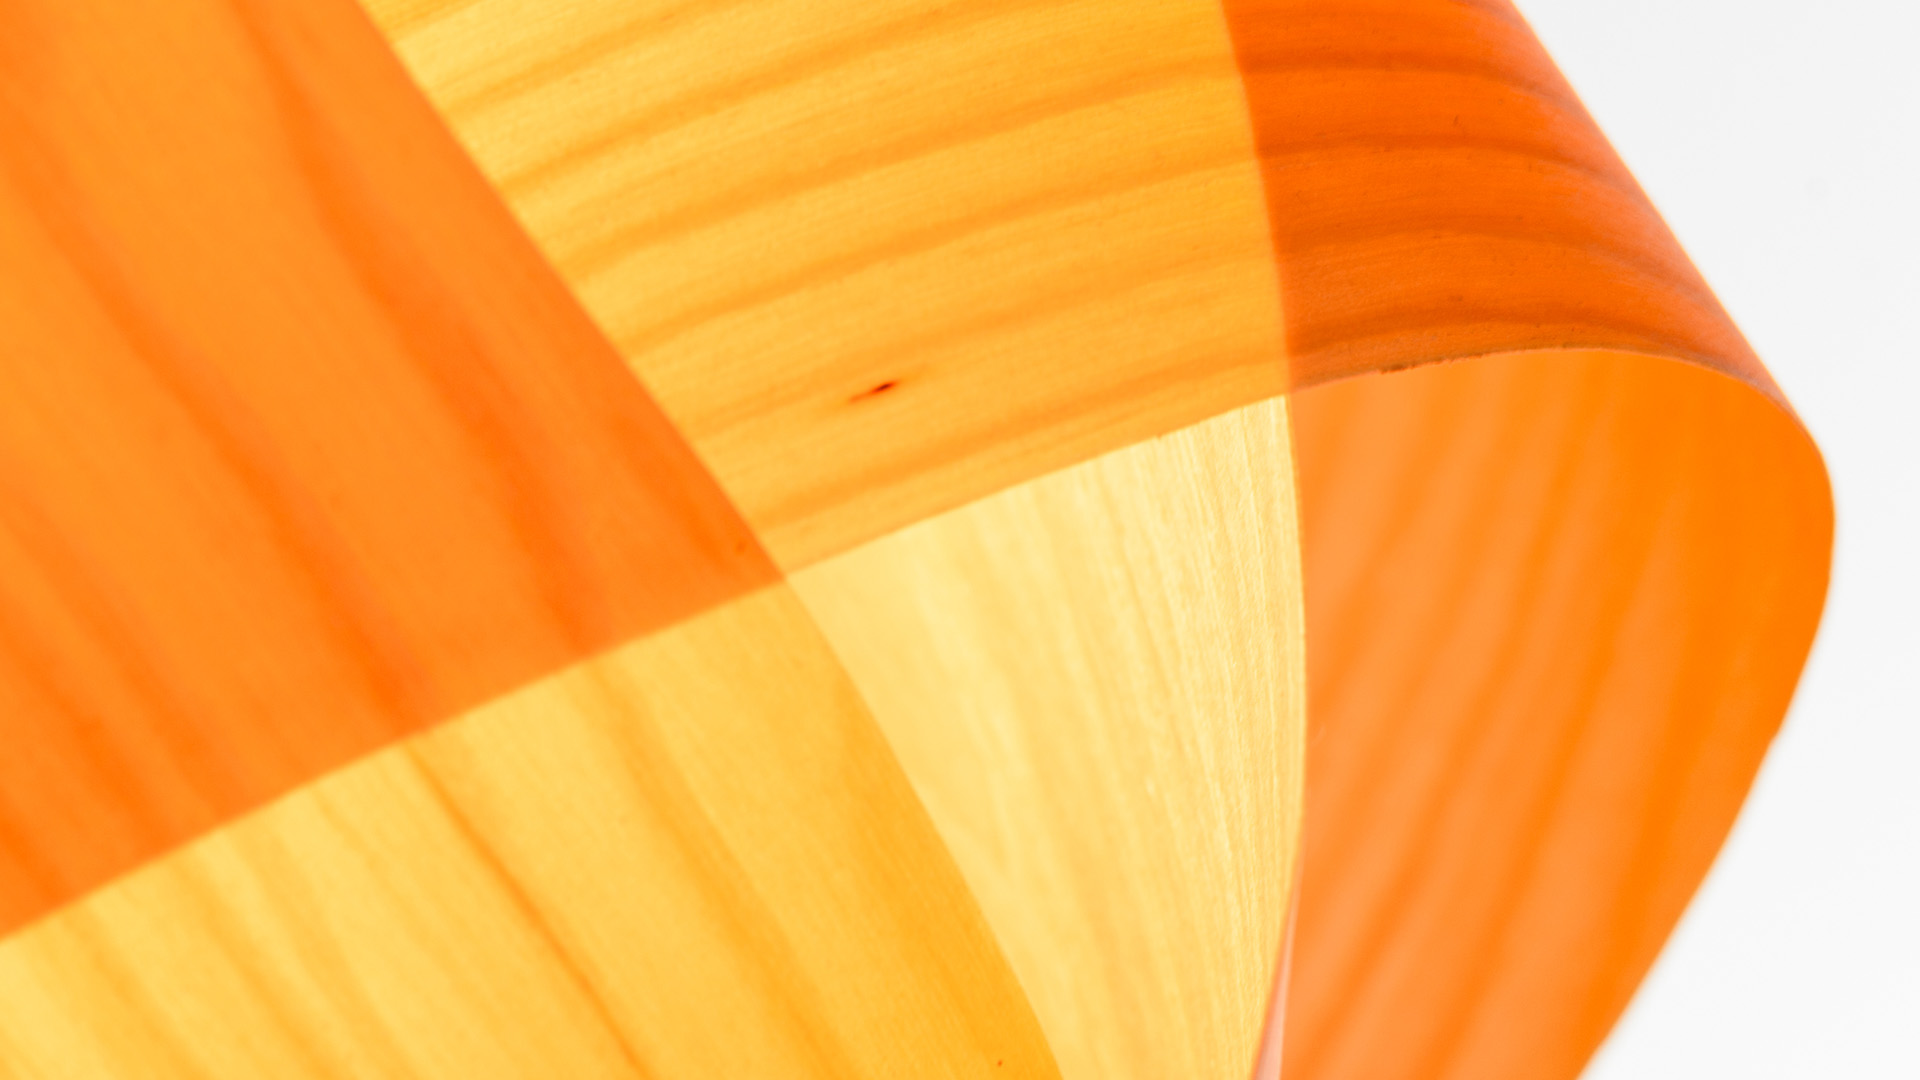 SAT, NOV 4 @ARTS FACTORY - LIT: CULTURE CRAWL PREVIEW JURIED EXHIBIT. 281 Industrial Ave. 8:30 PM -10PM.Exhibit Dates: November 4 – November 12, 2017Featuring works by: Sorour Abdollahi, Fran Alexander, Ellen Bang, Chris Blades, Mark Bowen, Niina Chebry, Concealed Studio, Christian Dahlberg, Carolina de la Cajiga, Andrea Des Mazes, Robert Dewey, Michael Fitzsimmons, Deanna Fogstrom, Louise Francis-Smith, Lee Gerlach, Kristopher Grunert, Anyuta Gusakova, Tannis Hopkins, Laleh Javaheri, Katsumi Kimoto, Georgina Lohan, Kate MacDonald & Les Sears, Pilar Mehlis, Eric Neighbour, Mark Ollinger, George Rammell, Antony Rolland, Jacquie Rolston, Kemo Schedlosky, Tanya Slingsby, Laurel Swenson, Katie Tennant Horning, Richard Tetrault, Francis Tiffany, Trevor Van den Eijnden, Jeff Wilson, Grazyna Wolski